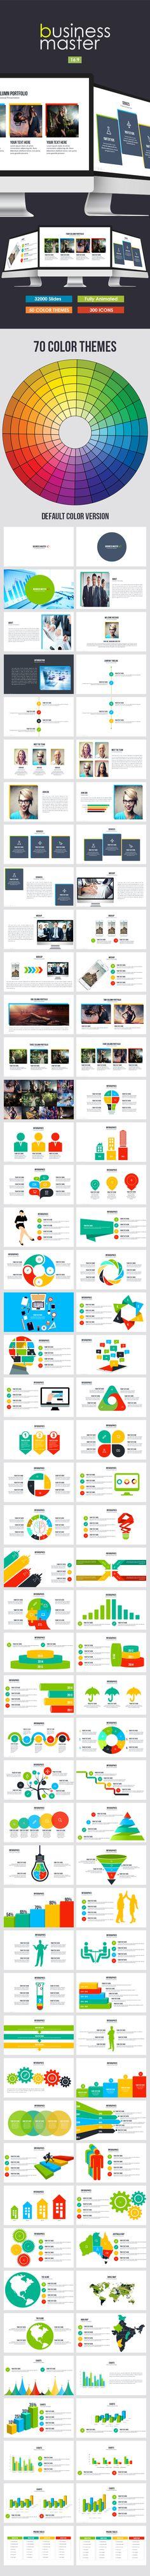 Keynote Presentation Template  More Presentation Templates Ppt